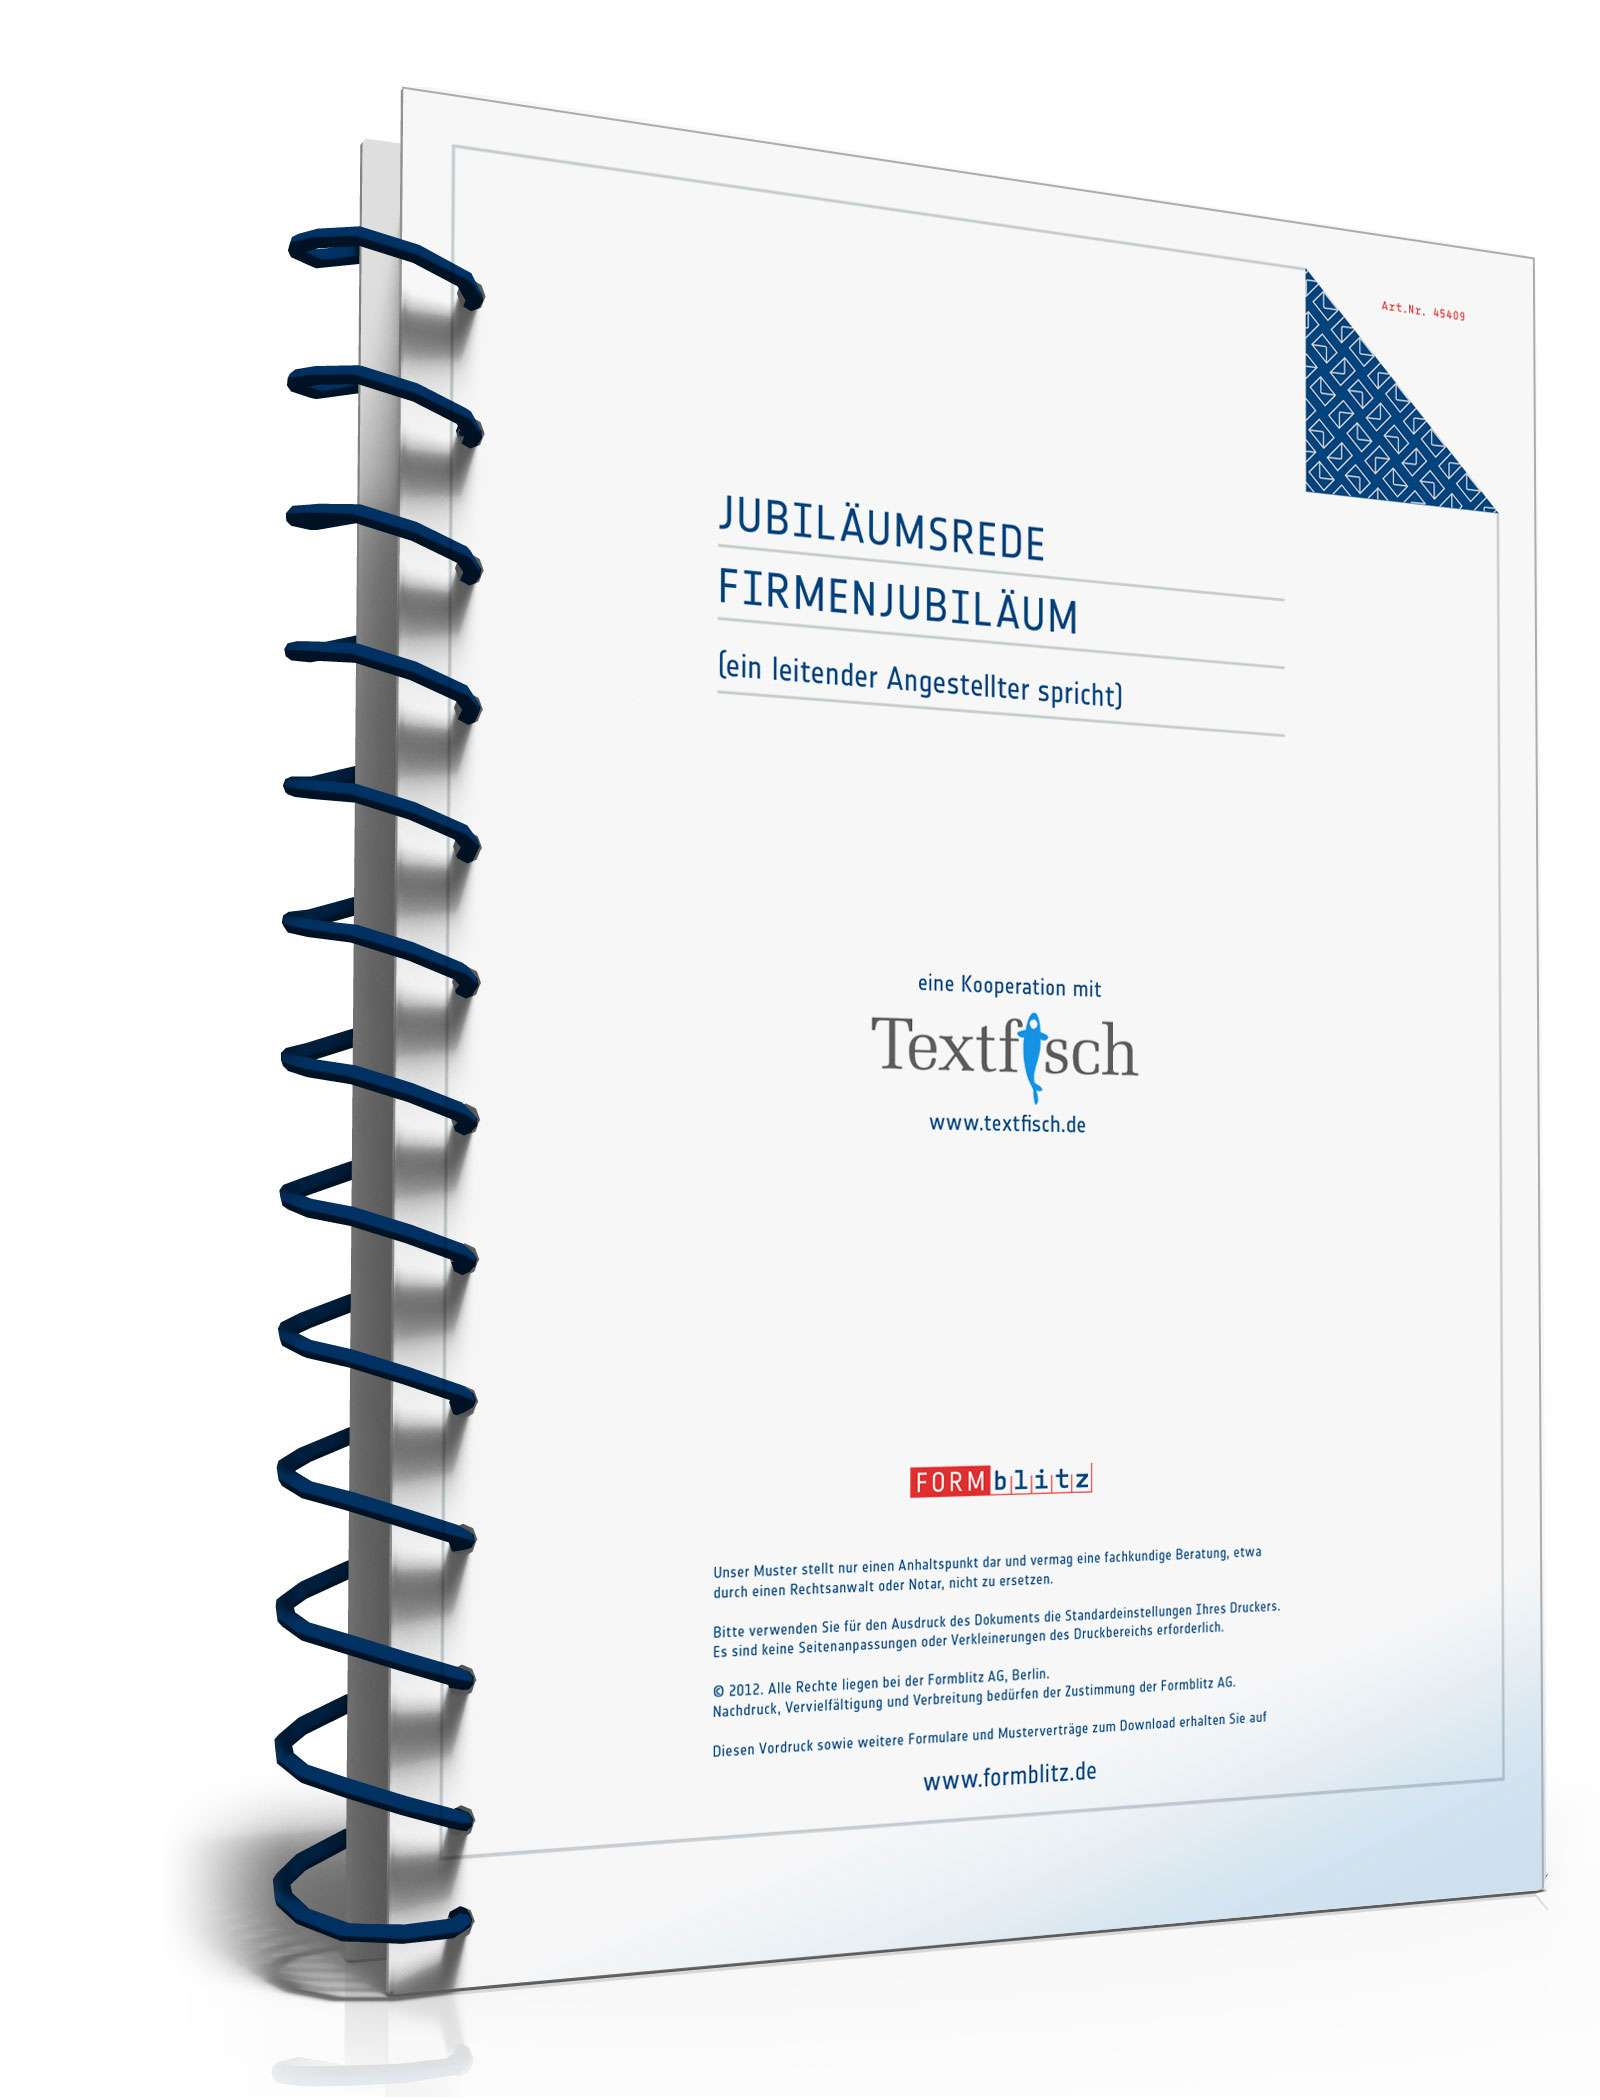 Großzügig Sponsoring Vereinbarung Vorlage Fotos - Entry Level Resume ...